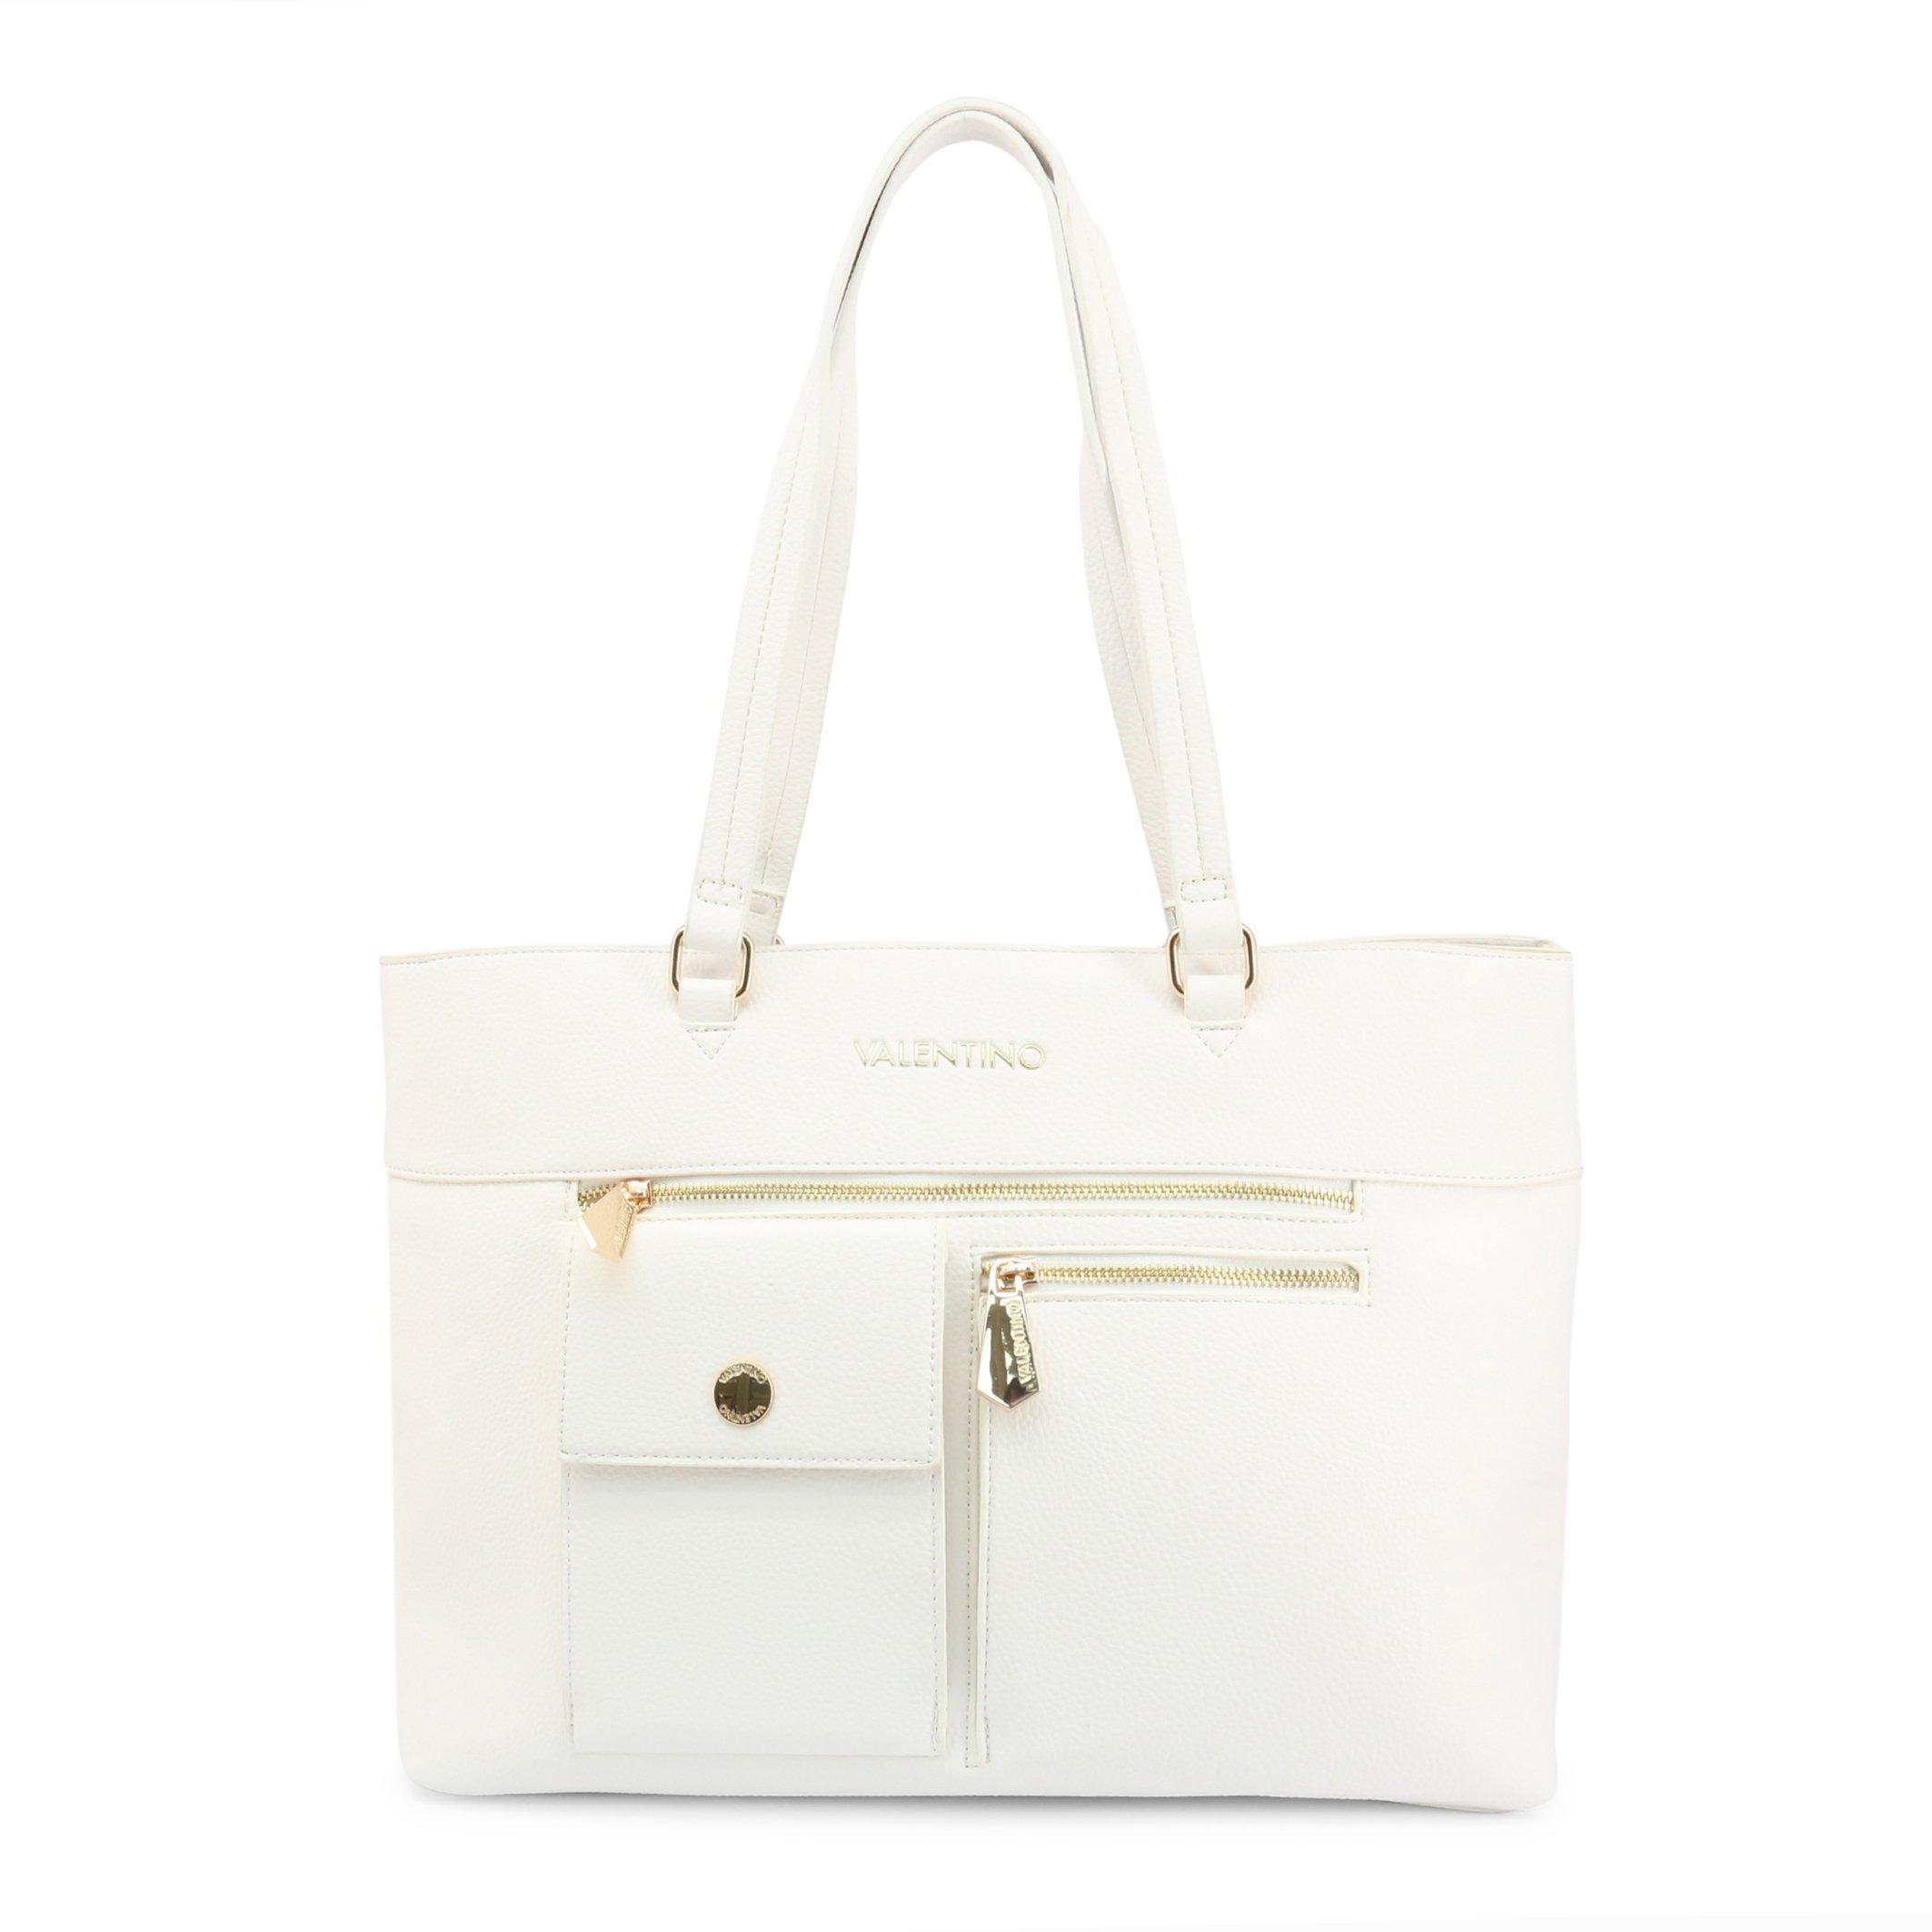 Valentino by Mario Valentino Women's Shopping Bag Various Colours CASPER-VBS3XL01 - white NOSIZE